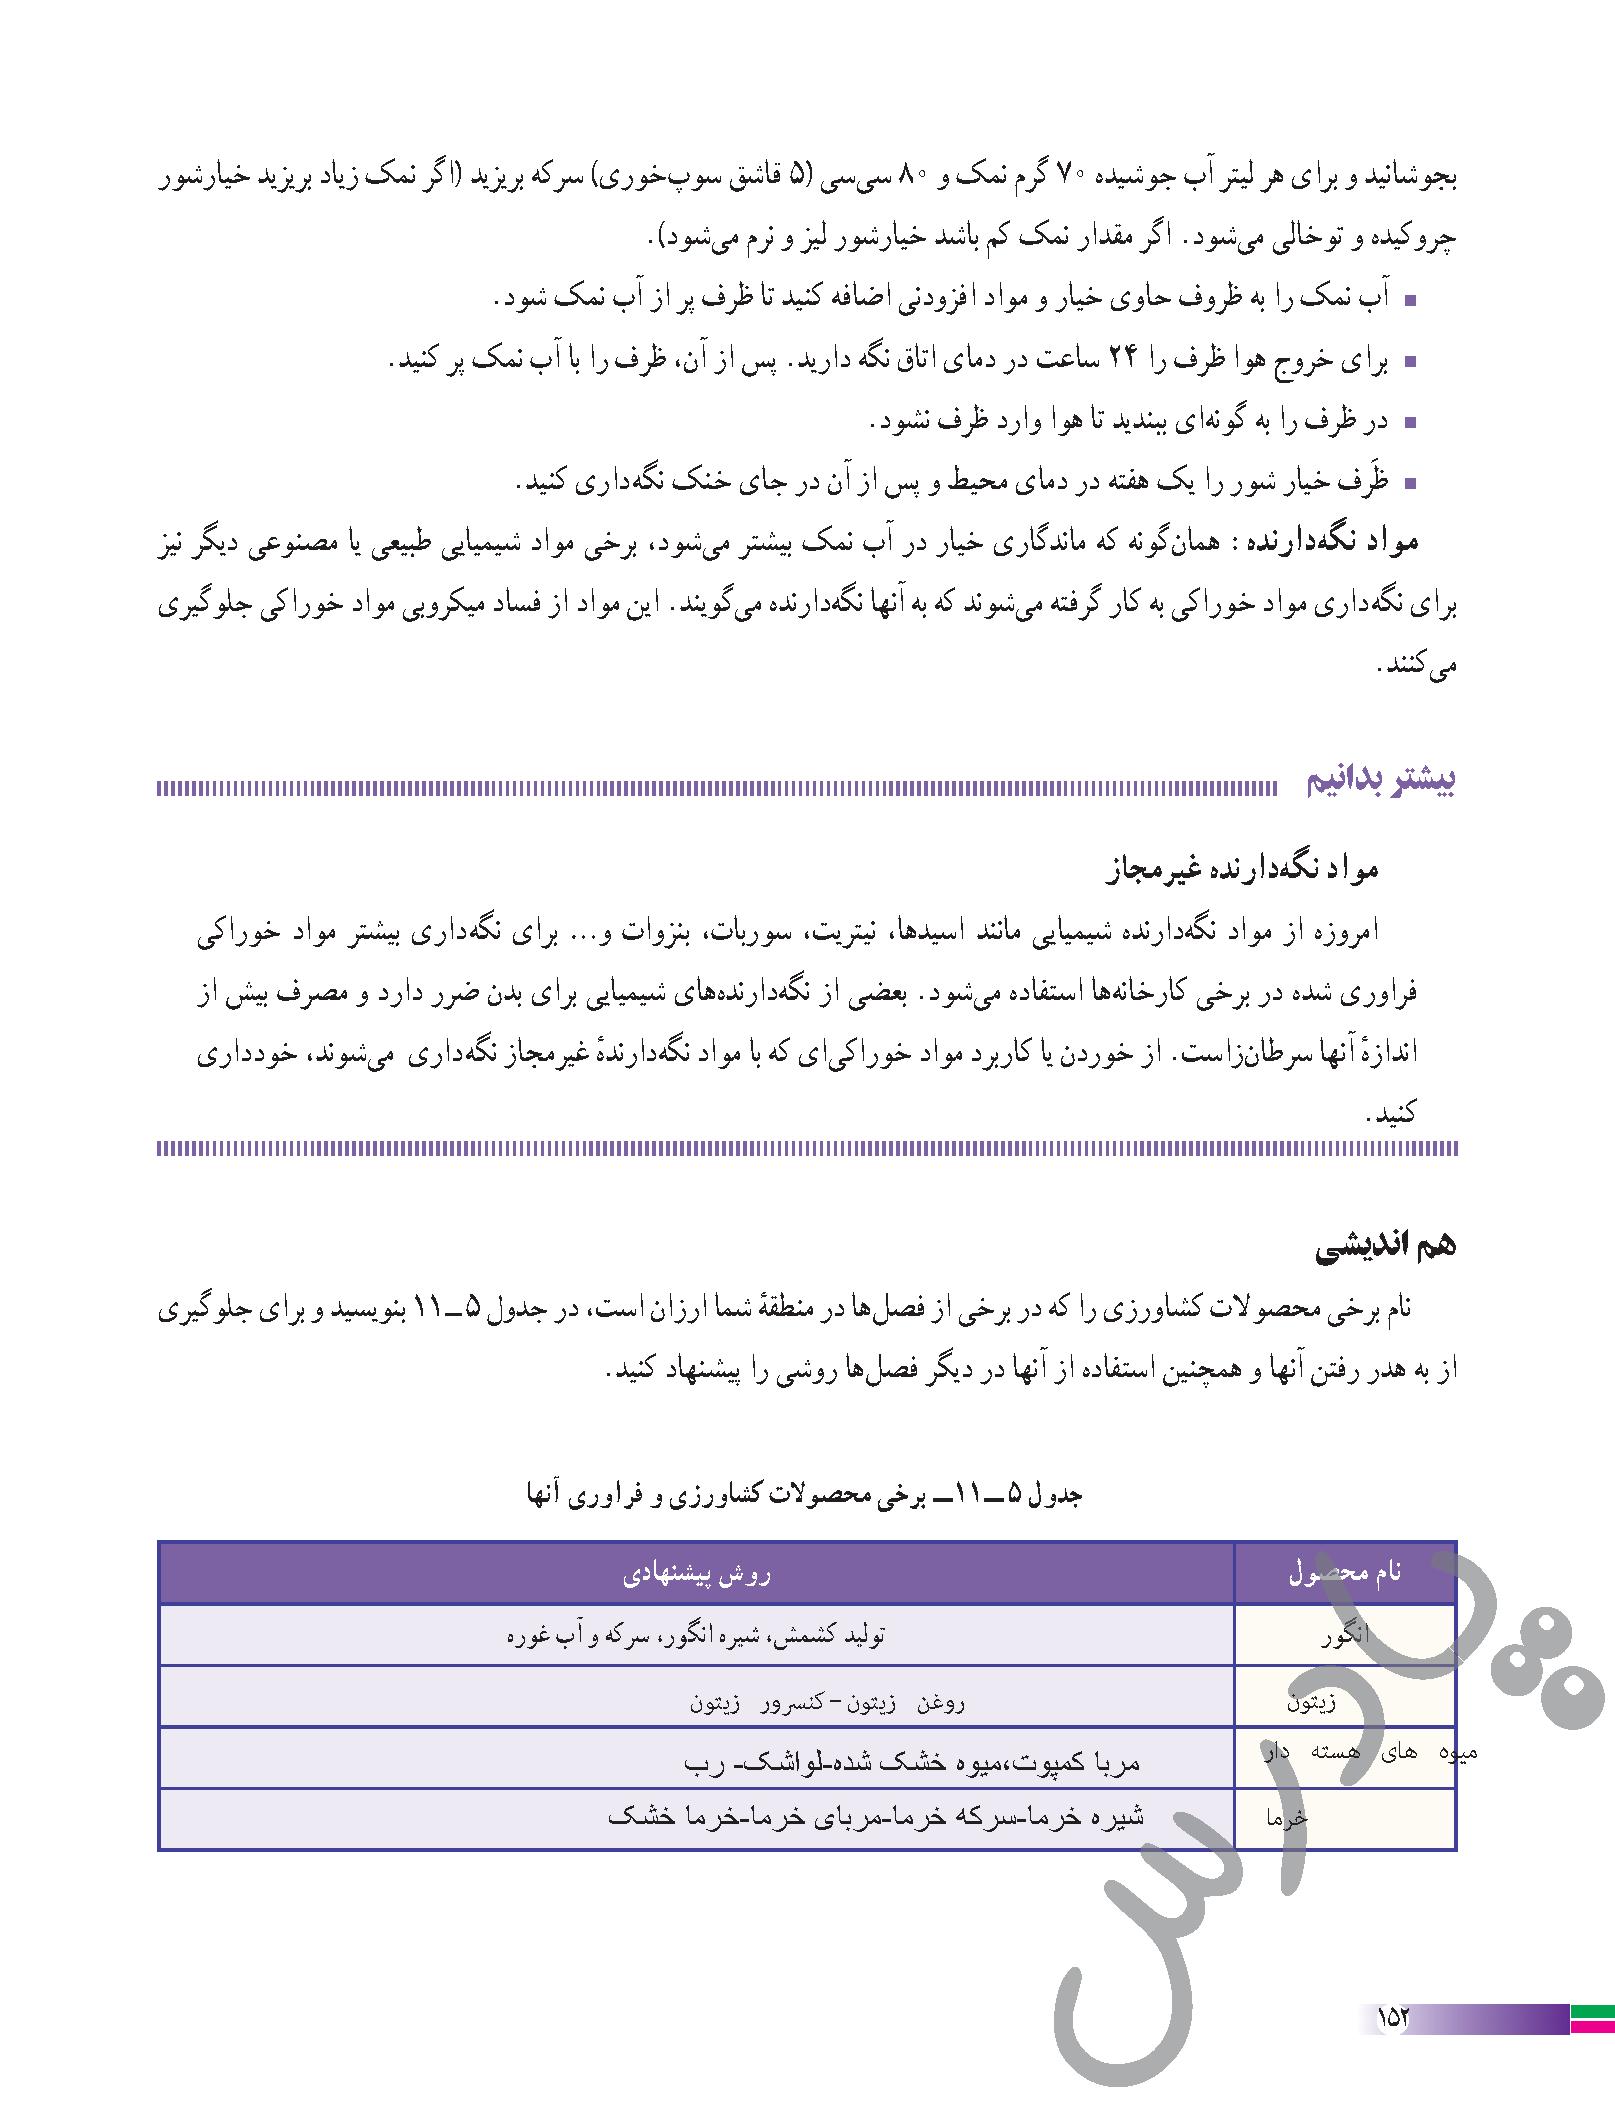 جواب کاردرکلاس صفحه 152 کاروفناوری هفتم